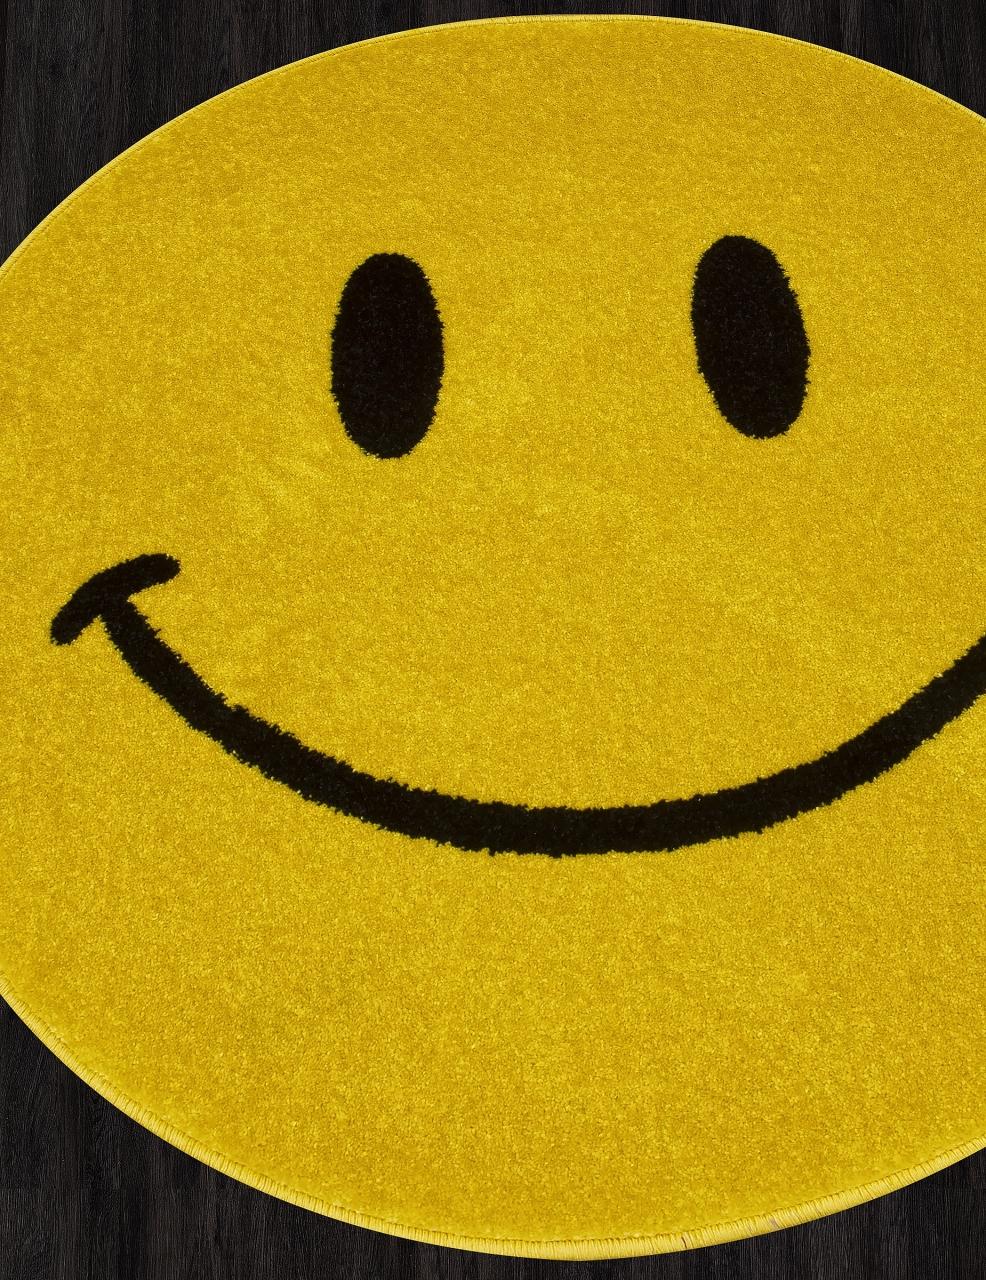 Ковер NC19 - YELLOW - Круг - коллекция SMILE